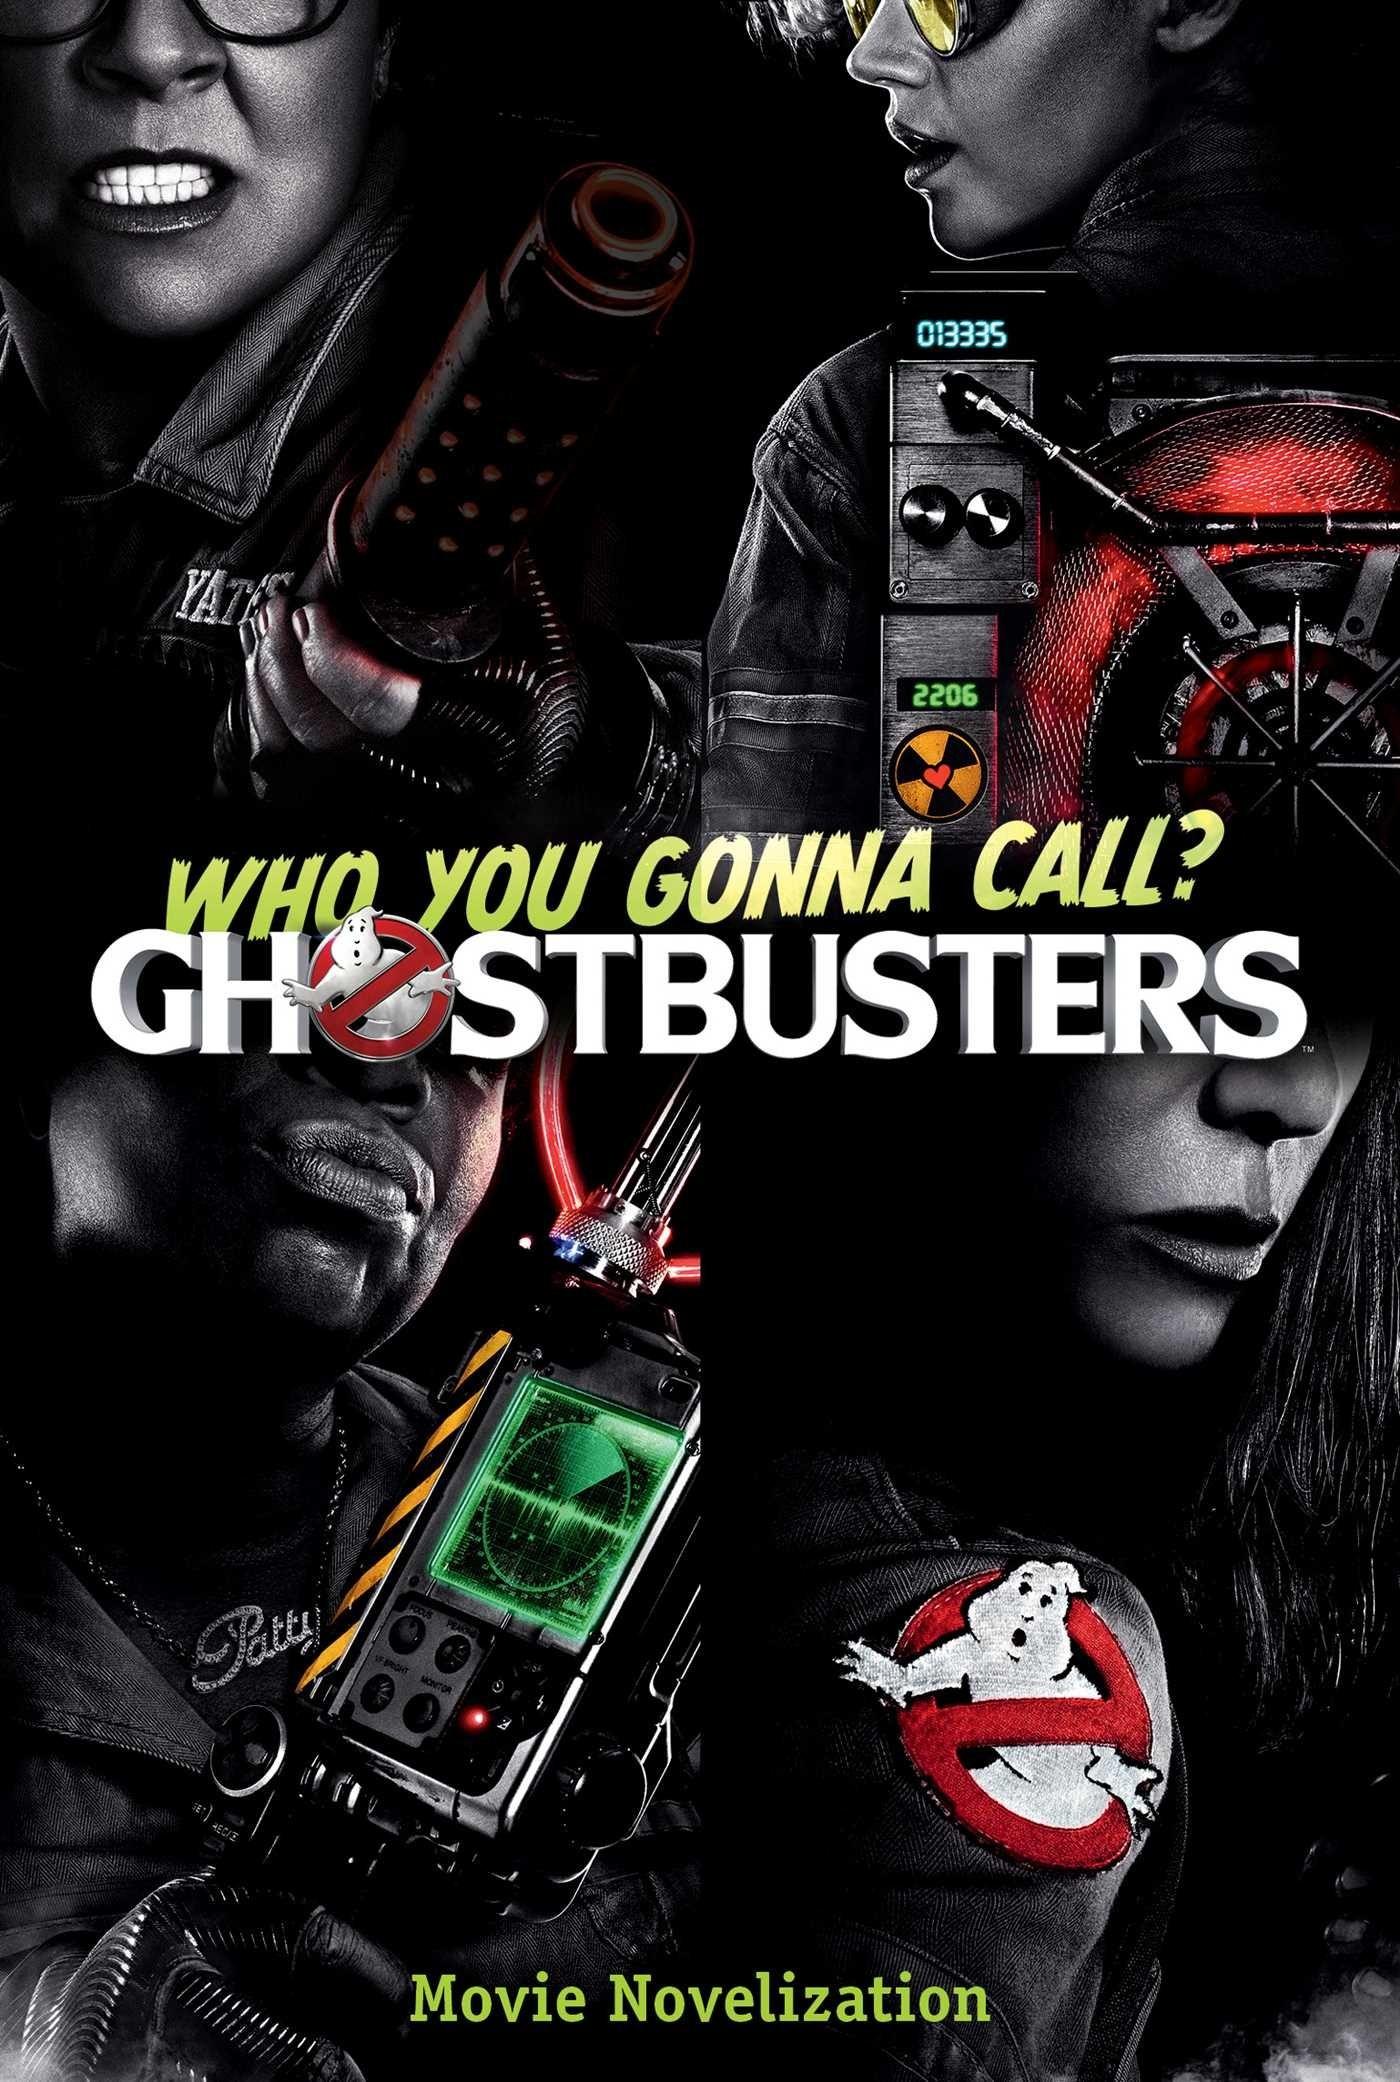 Kristen Wiig Ghostbusters Poster